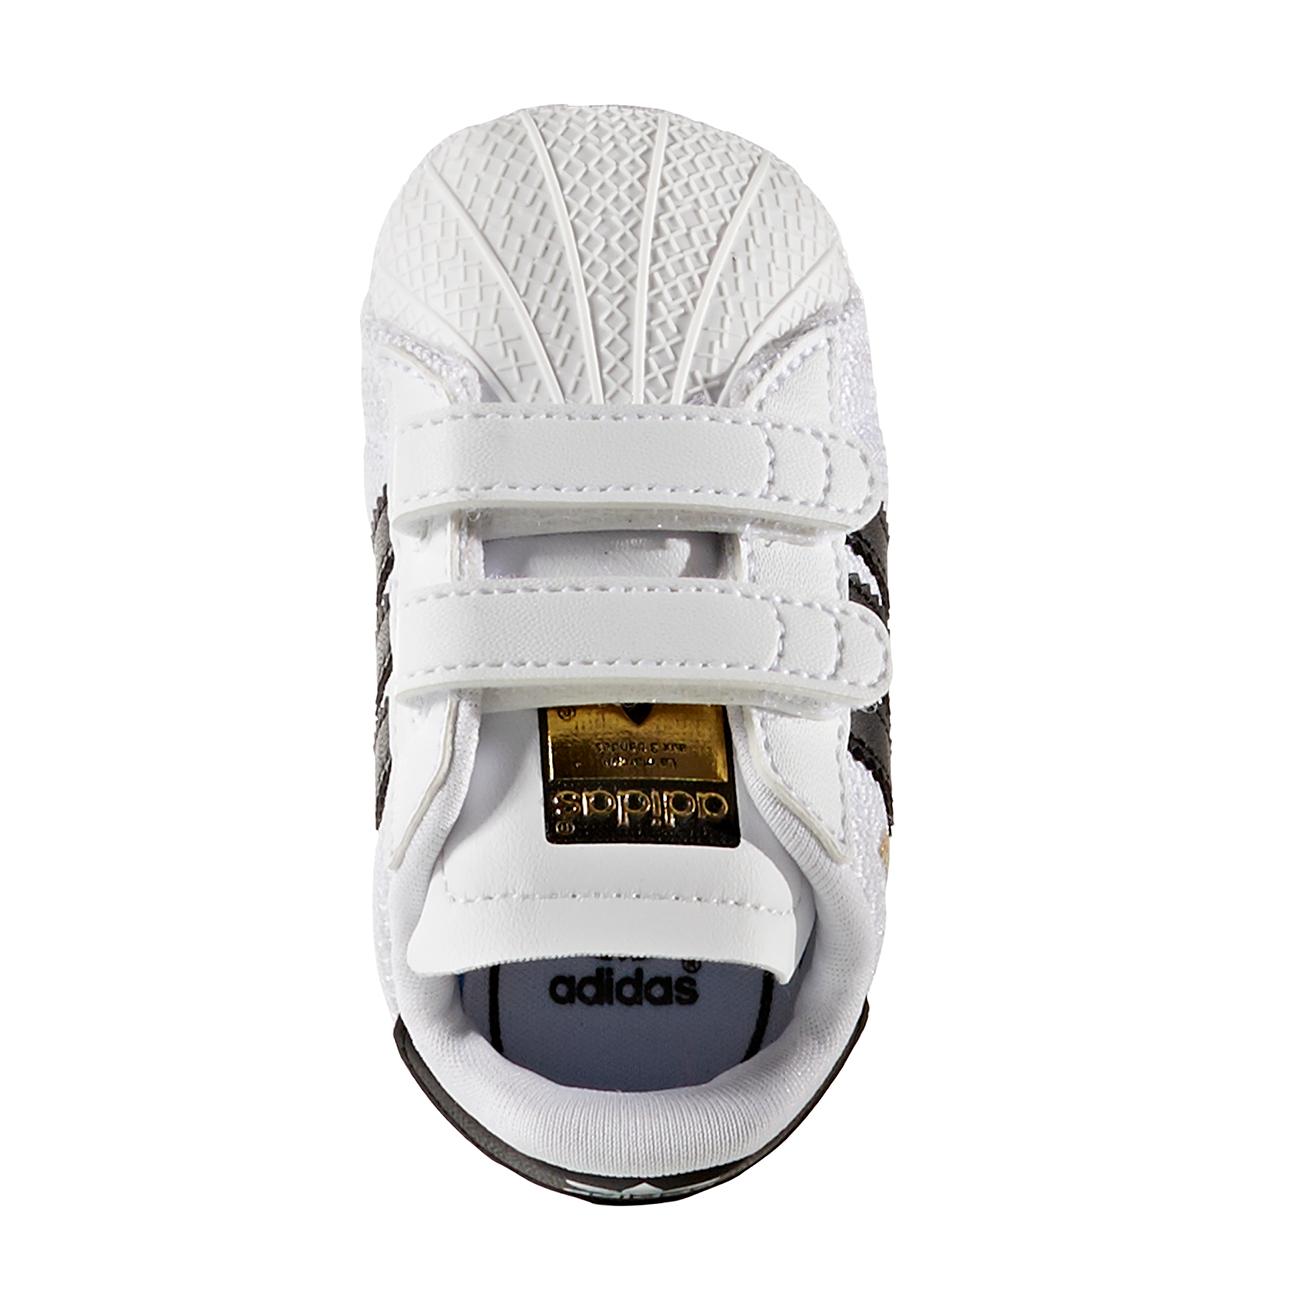 1cfc017c712 clearance adidas superstar børn hvid 9c713 5760d; sale adidas baby superstar  sneakers white black 66886 392ac